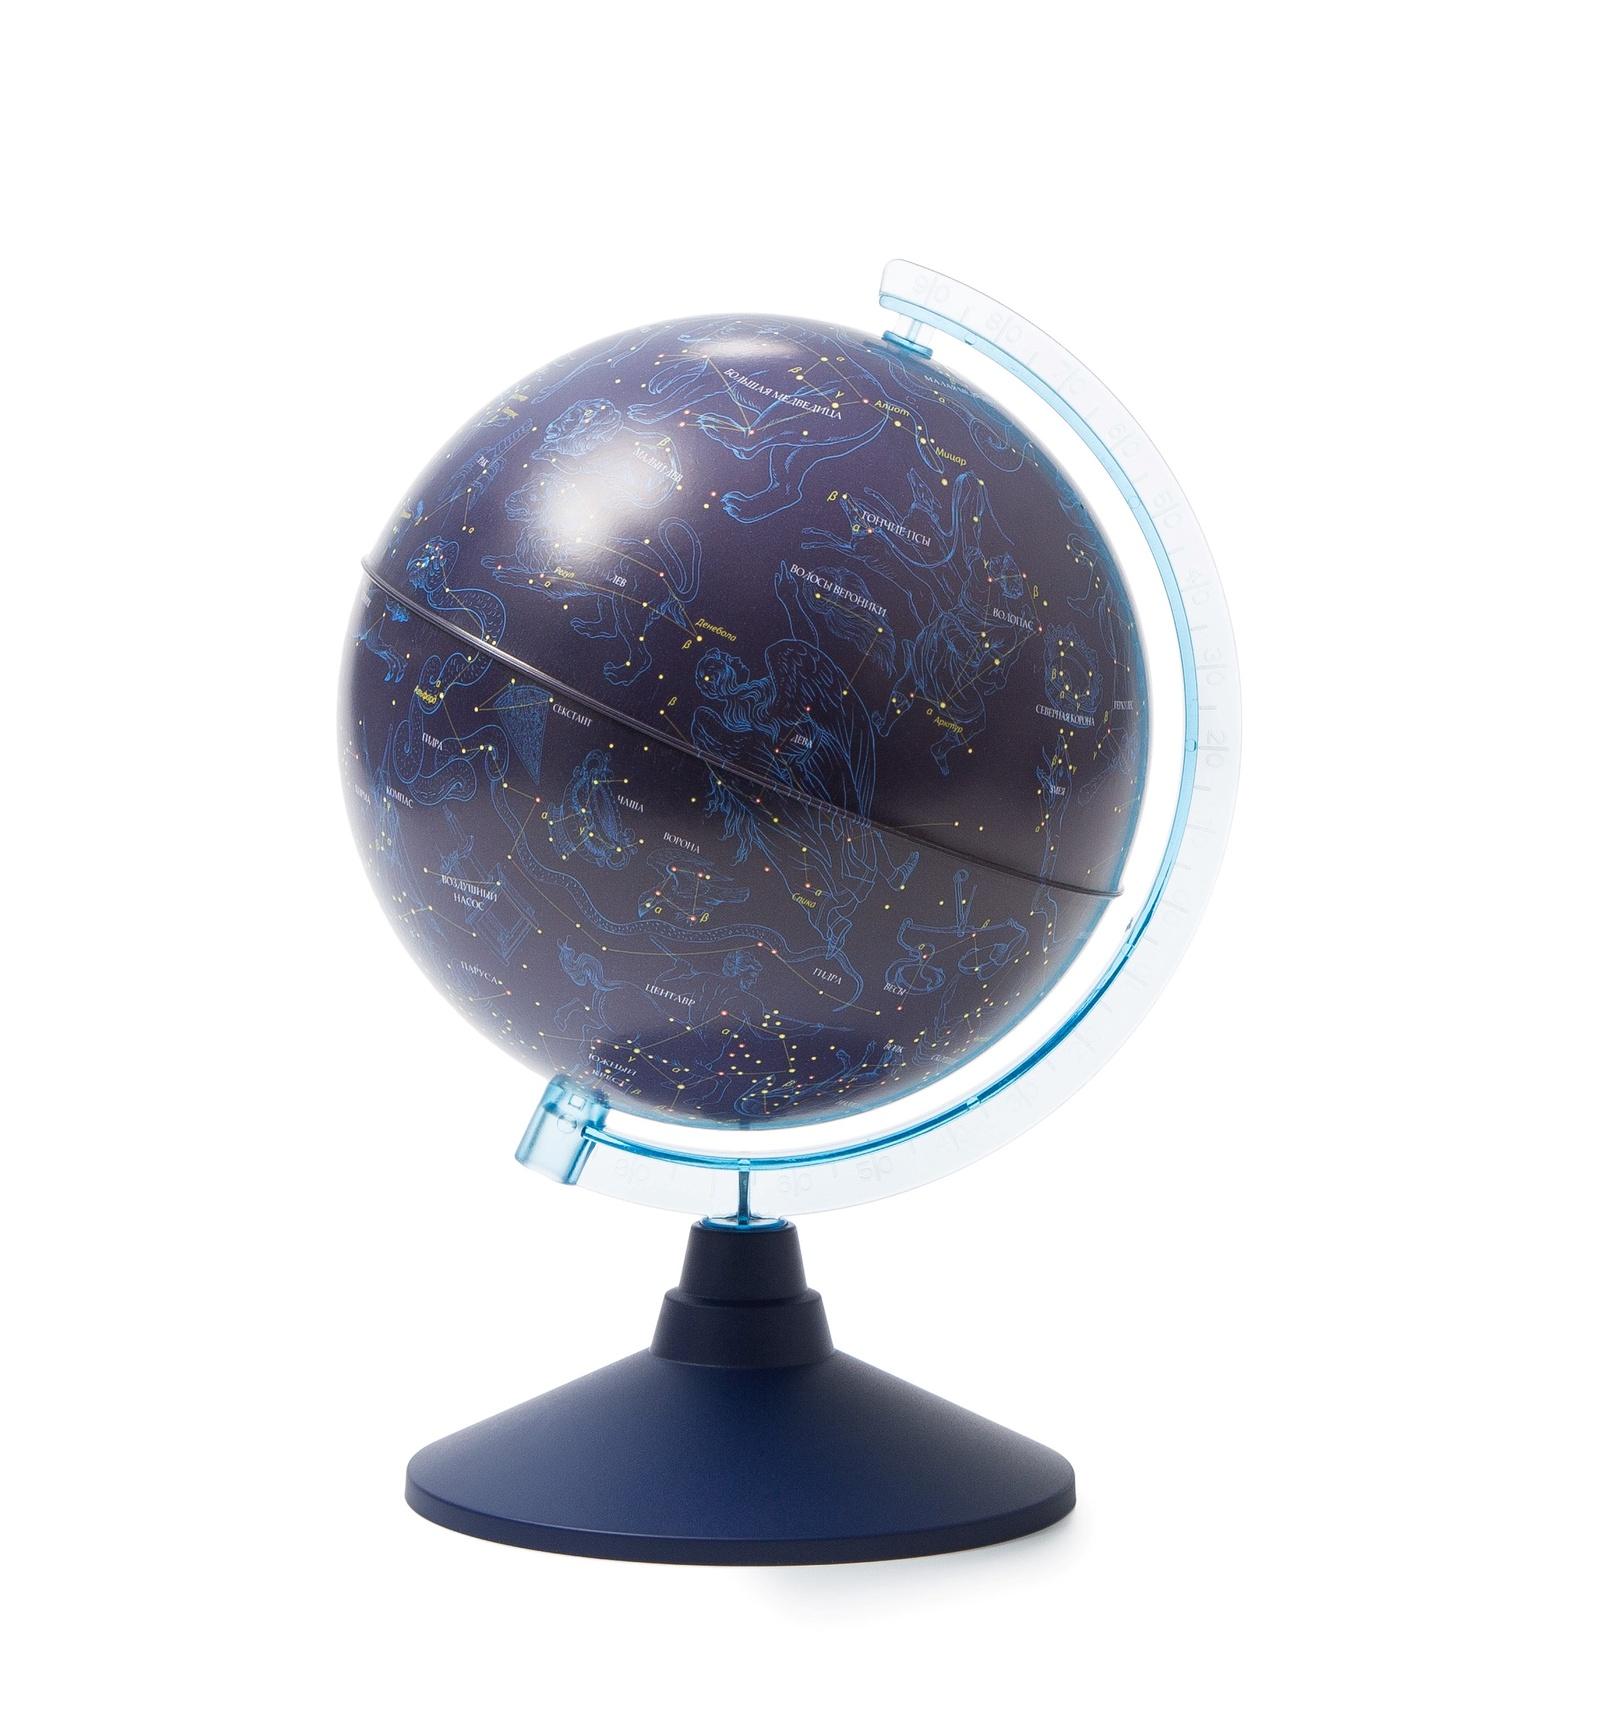 цена на Глобус Globen Звездного неба, диаметр 21 см